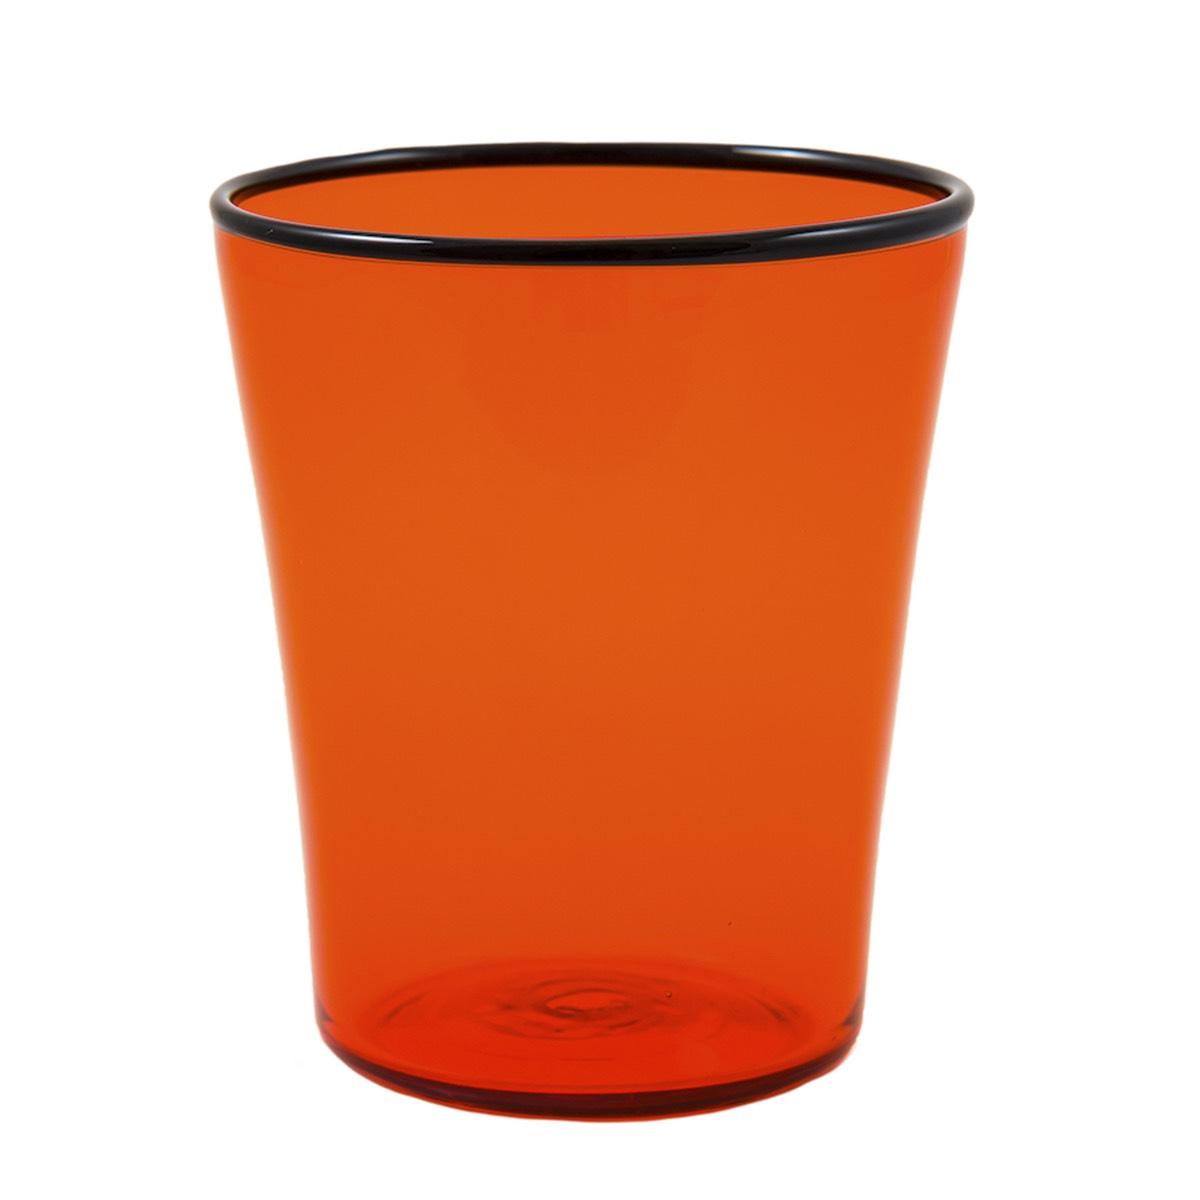 mascia-orange-glass-black-murano